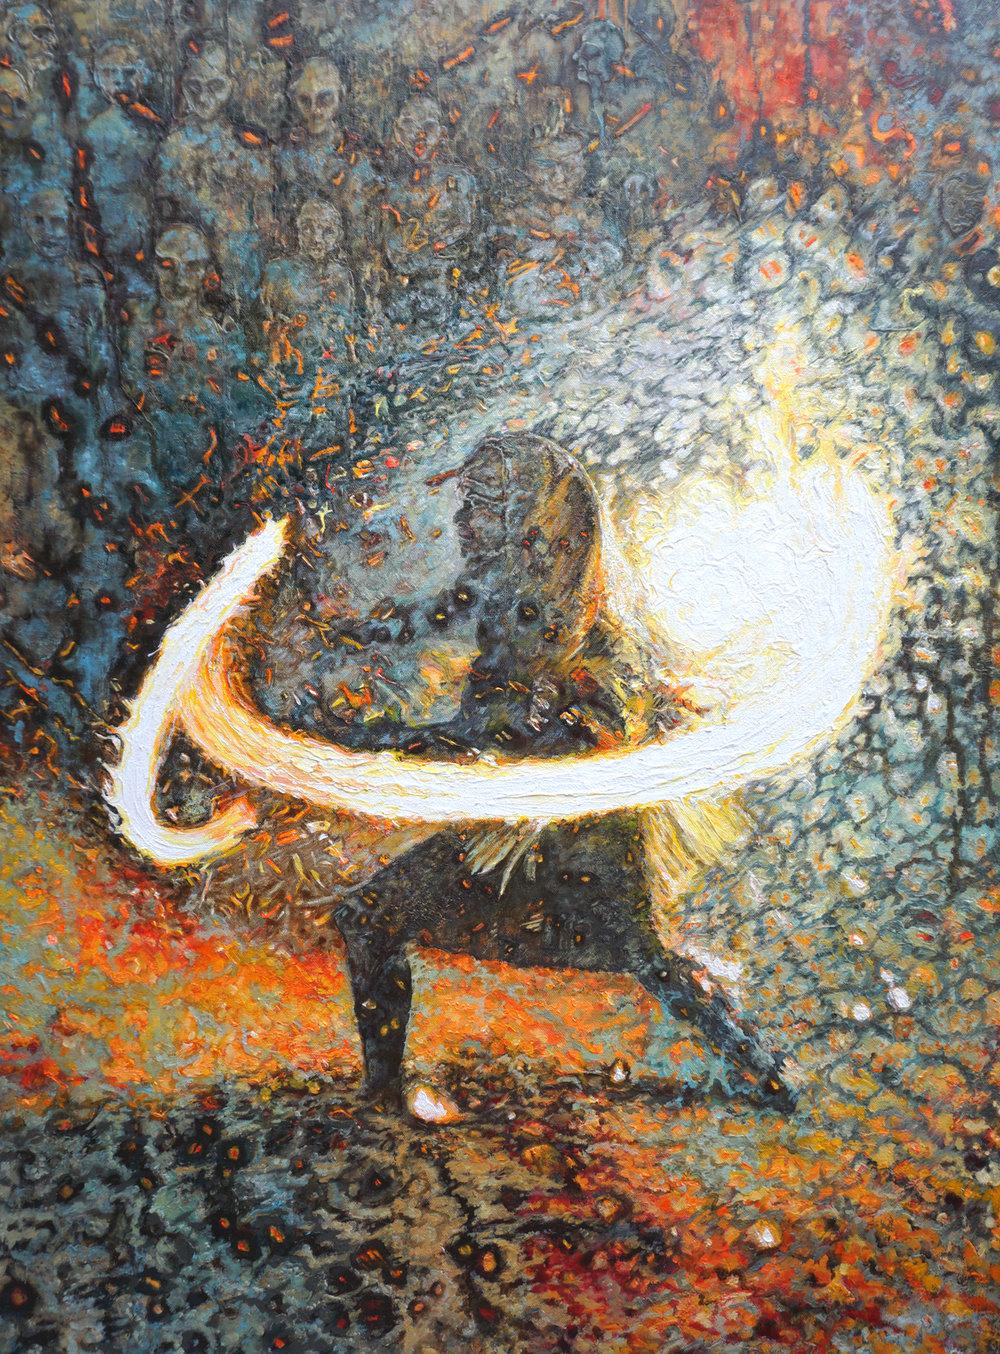 SANCTUARY OF FIRE - Ben Taylor/a.k.a. Mometo